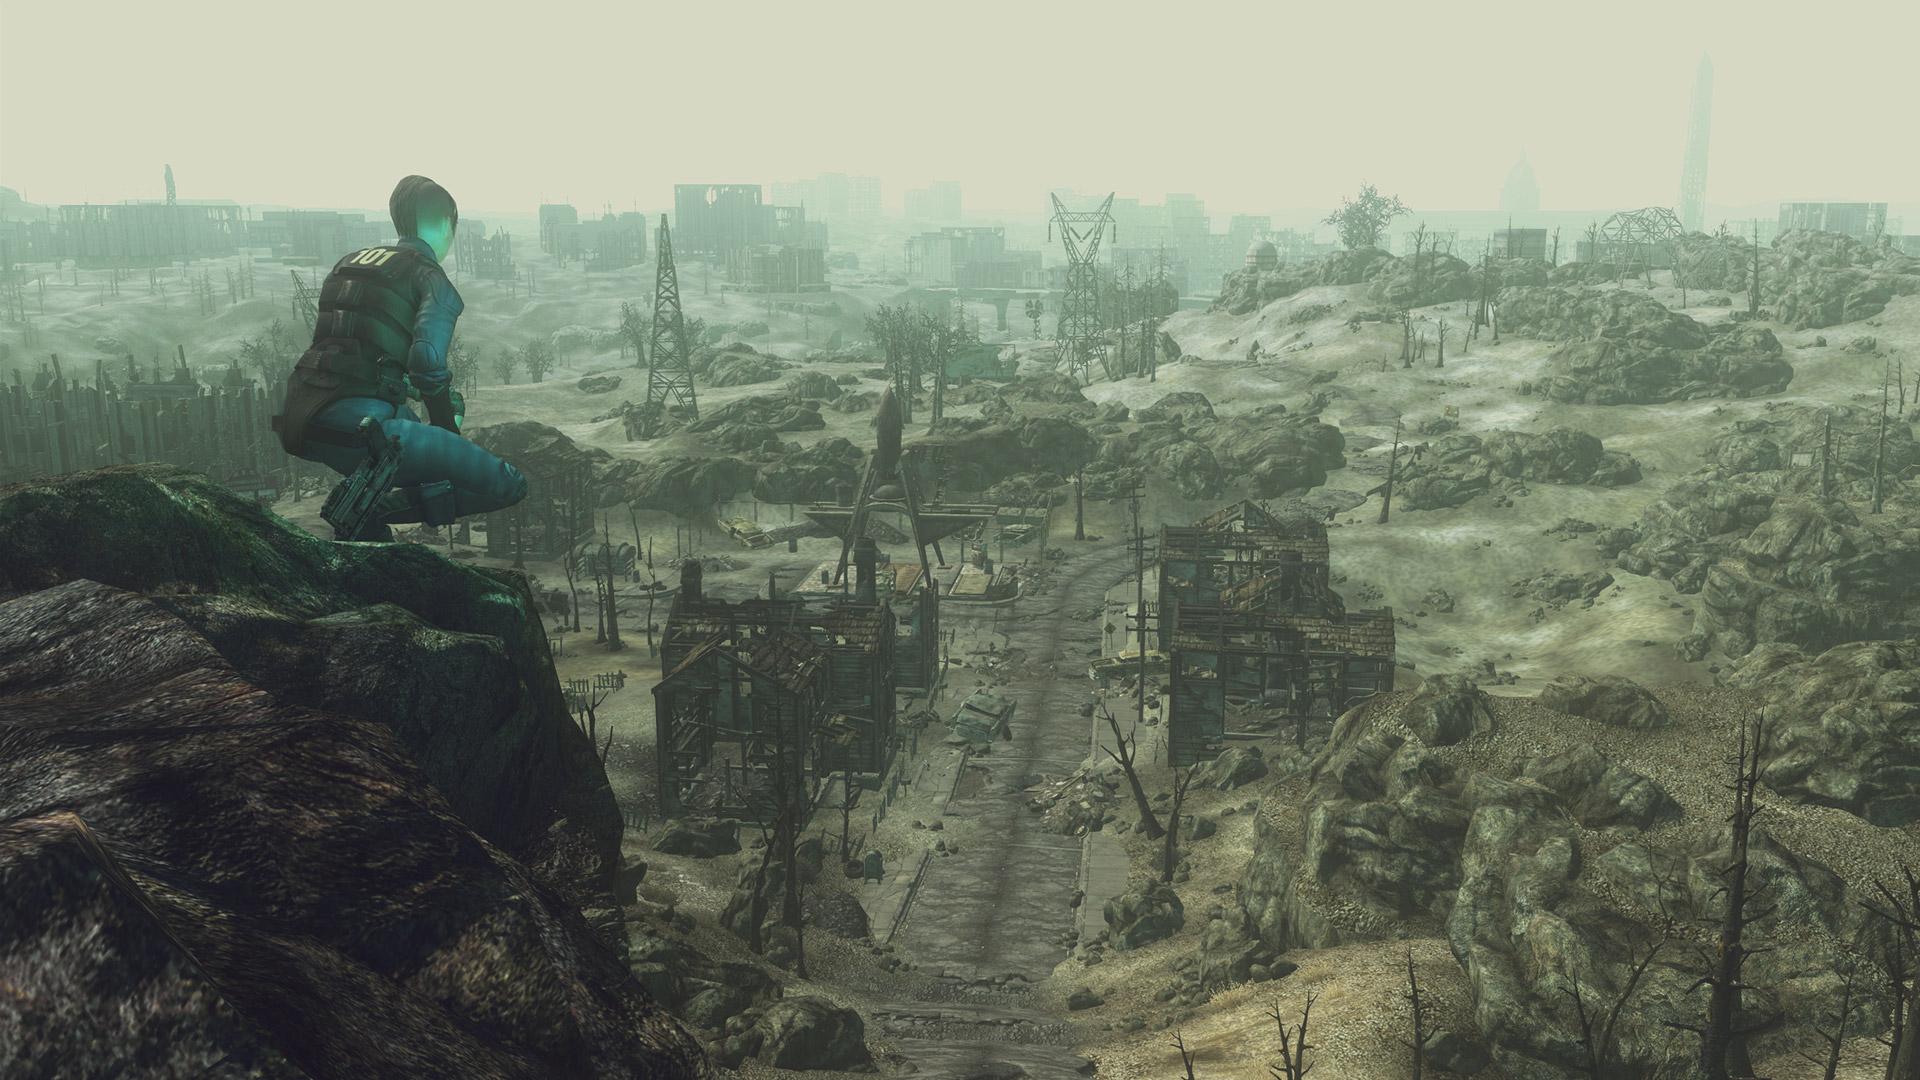 Free Fallout 3 Wallpaper in 1920x1080